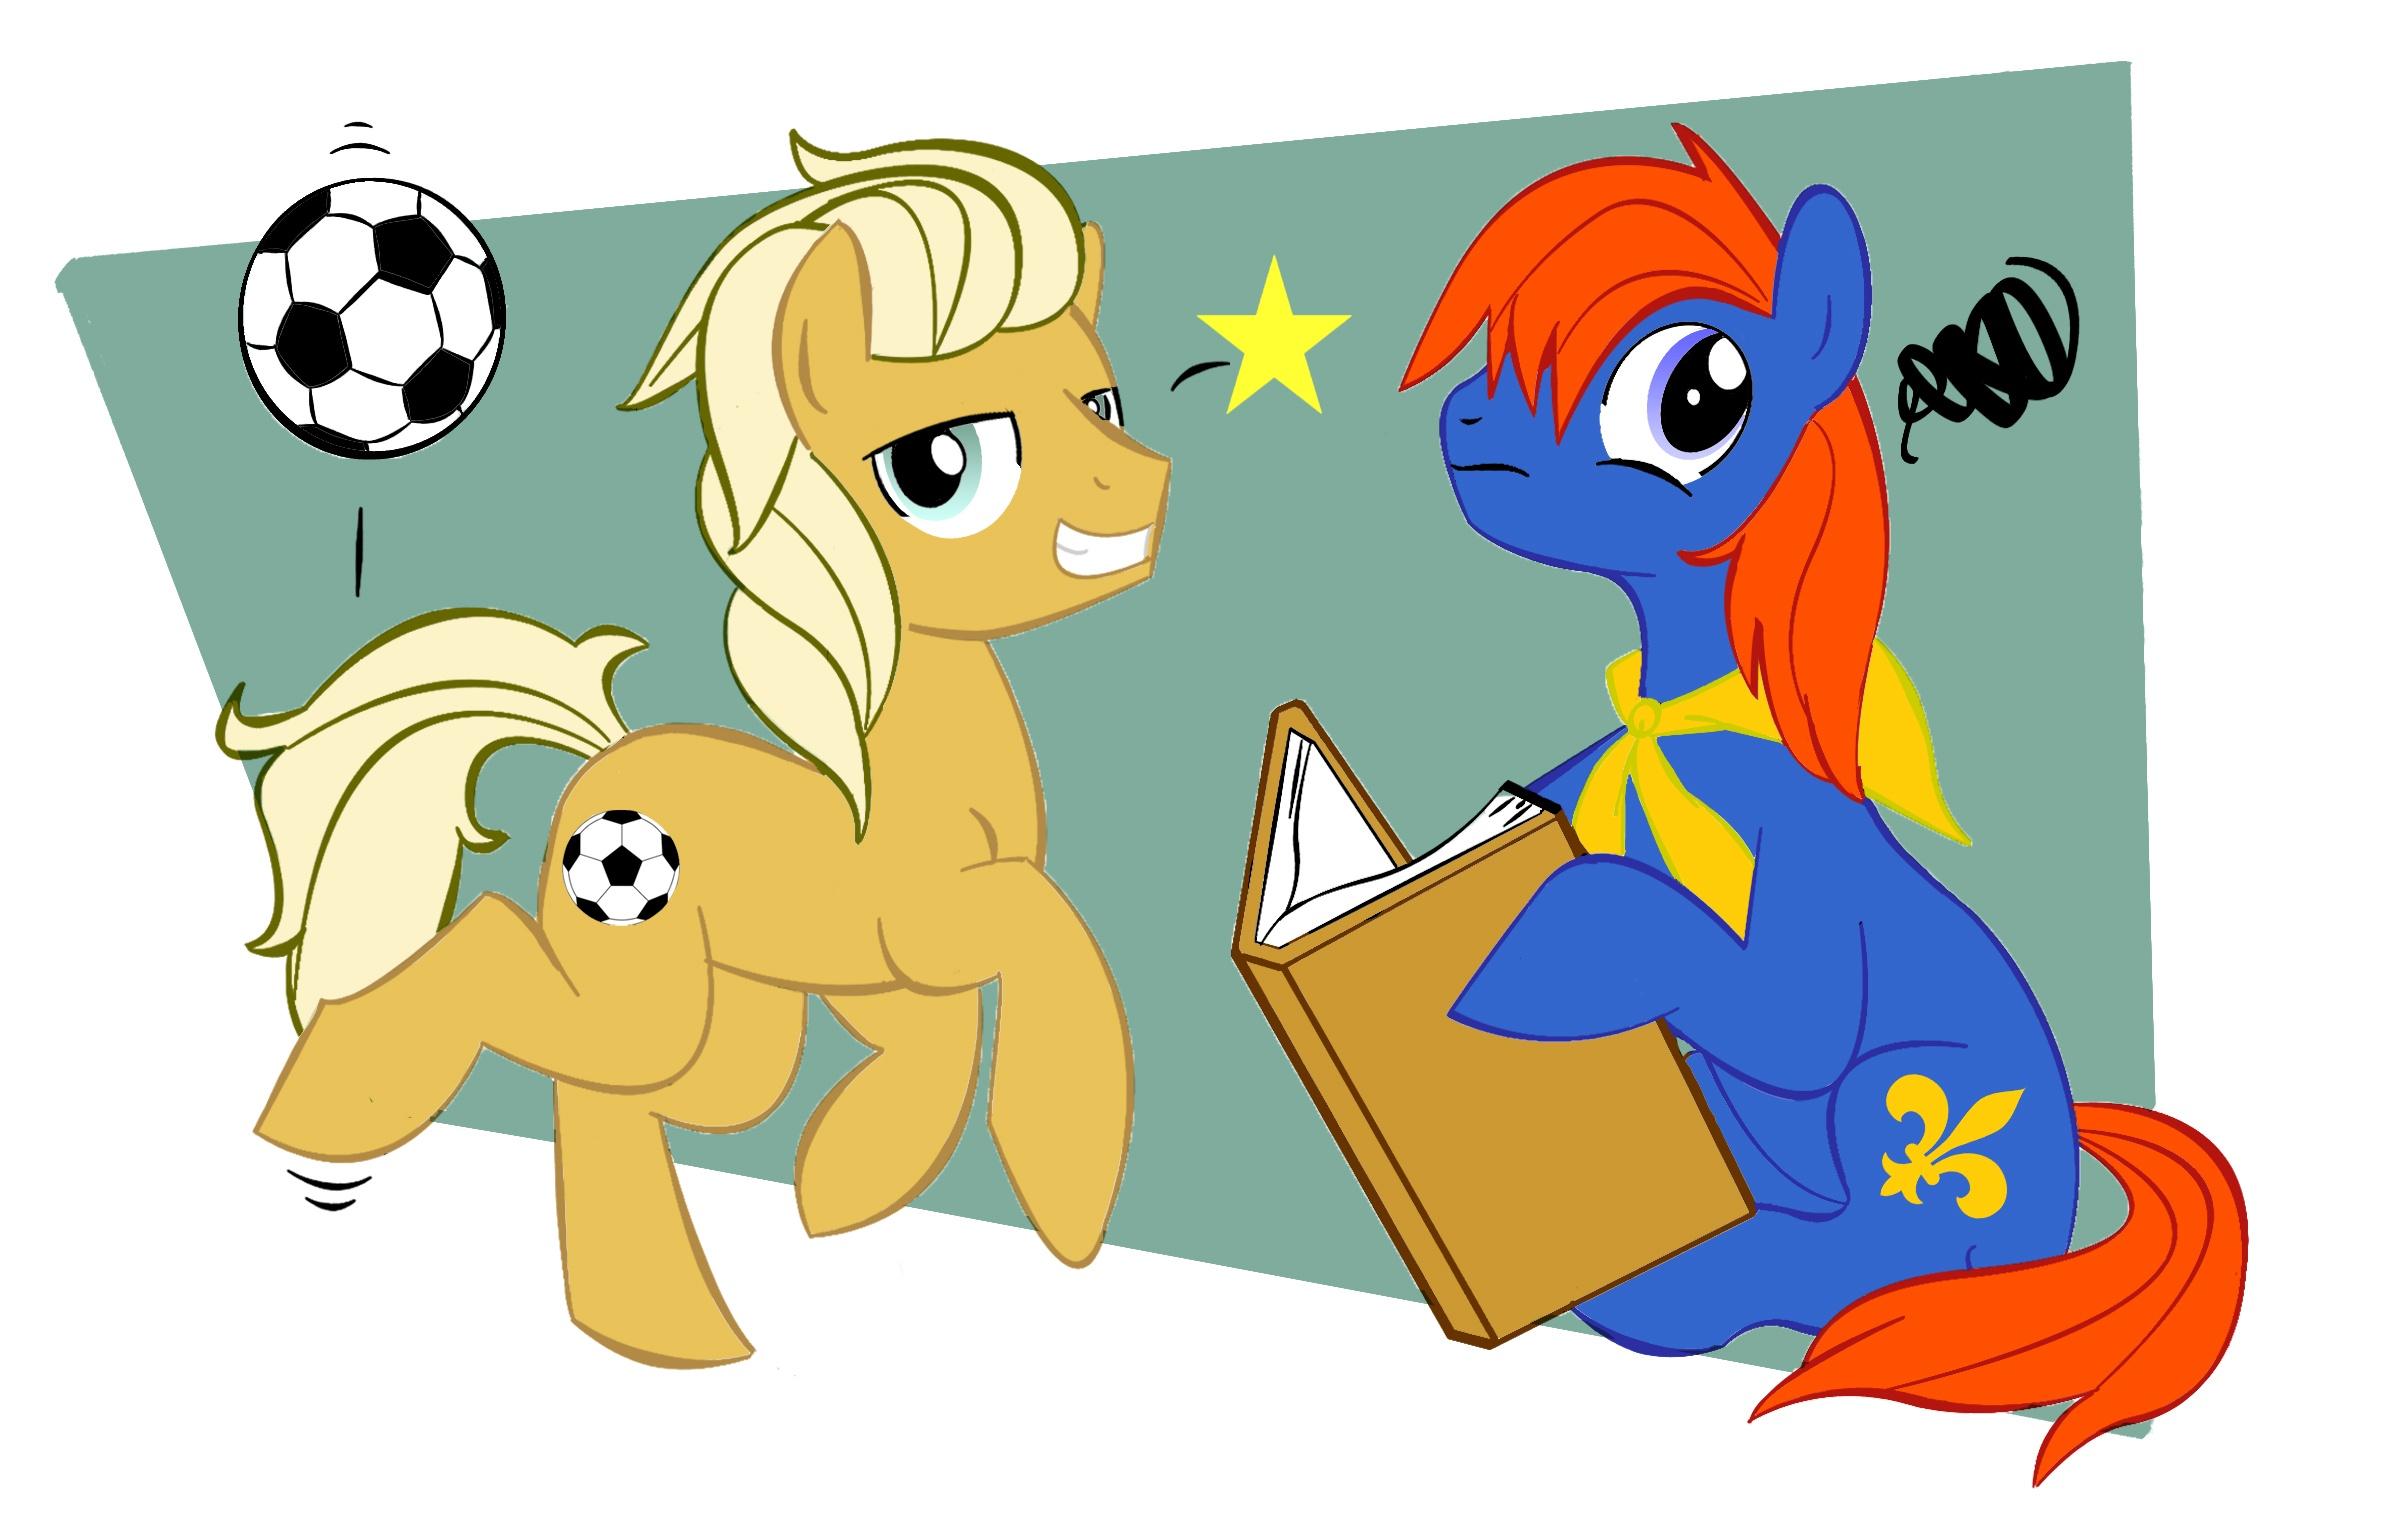 [Obrázek: 103461__safe_g1_g1+to+g4_my+little+pony+...baki88.jpg]